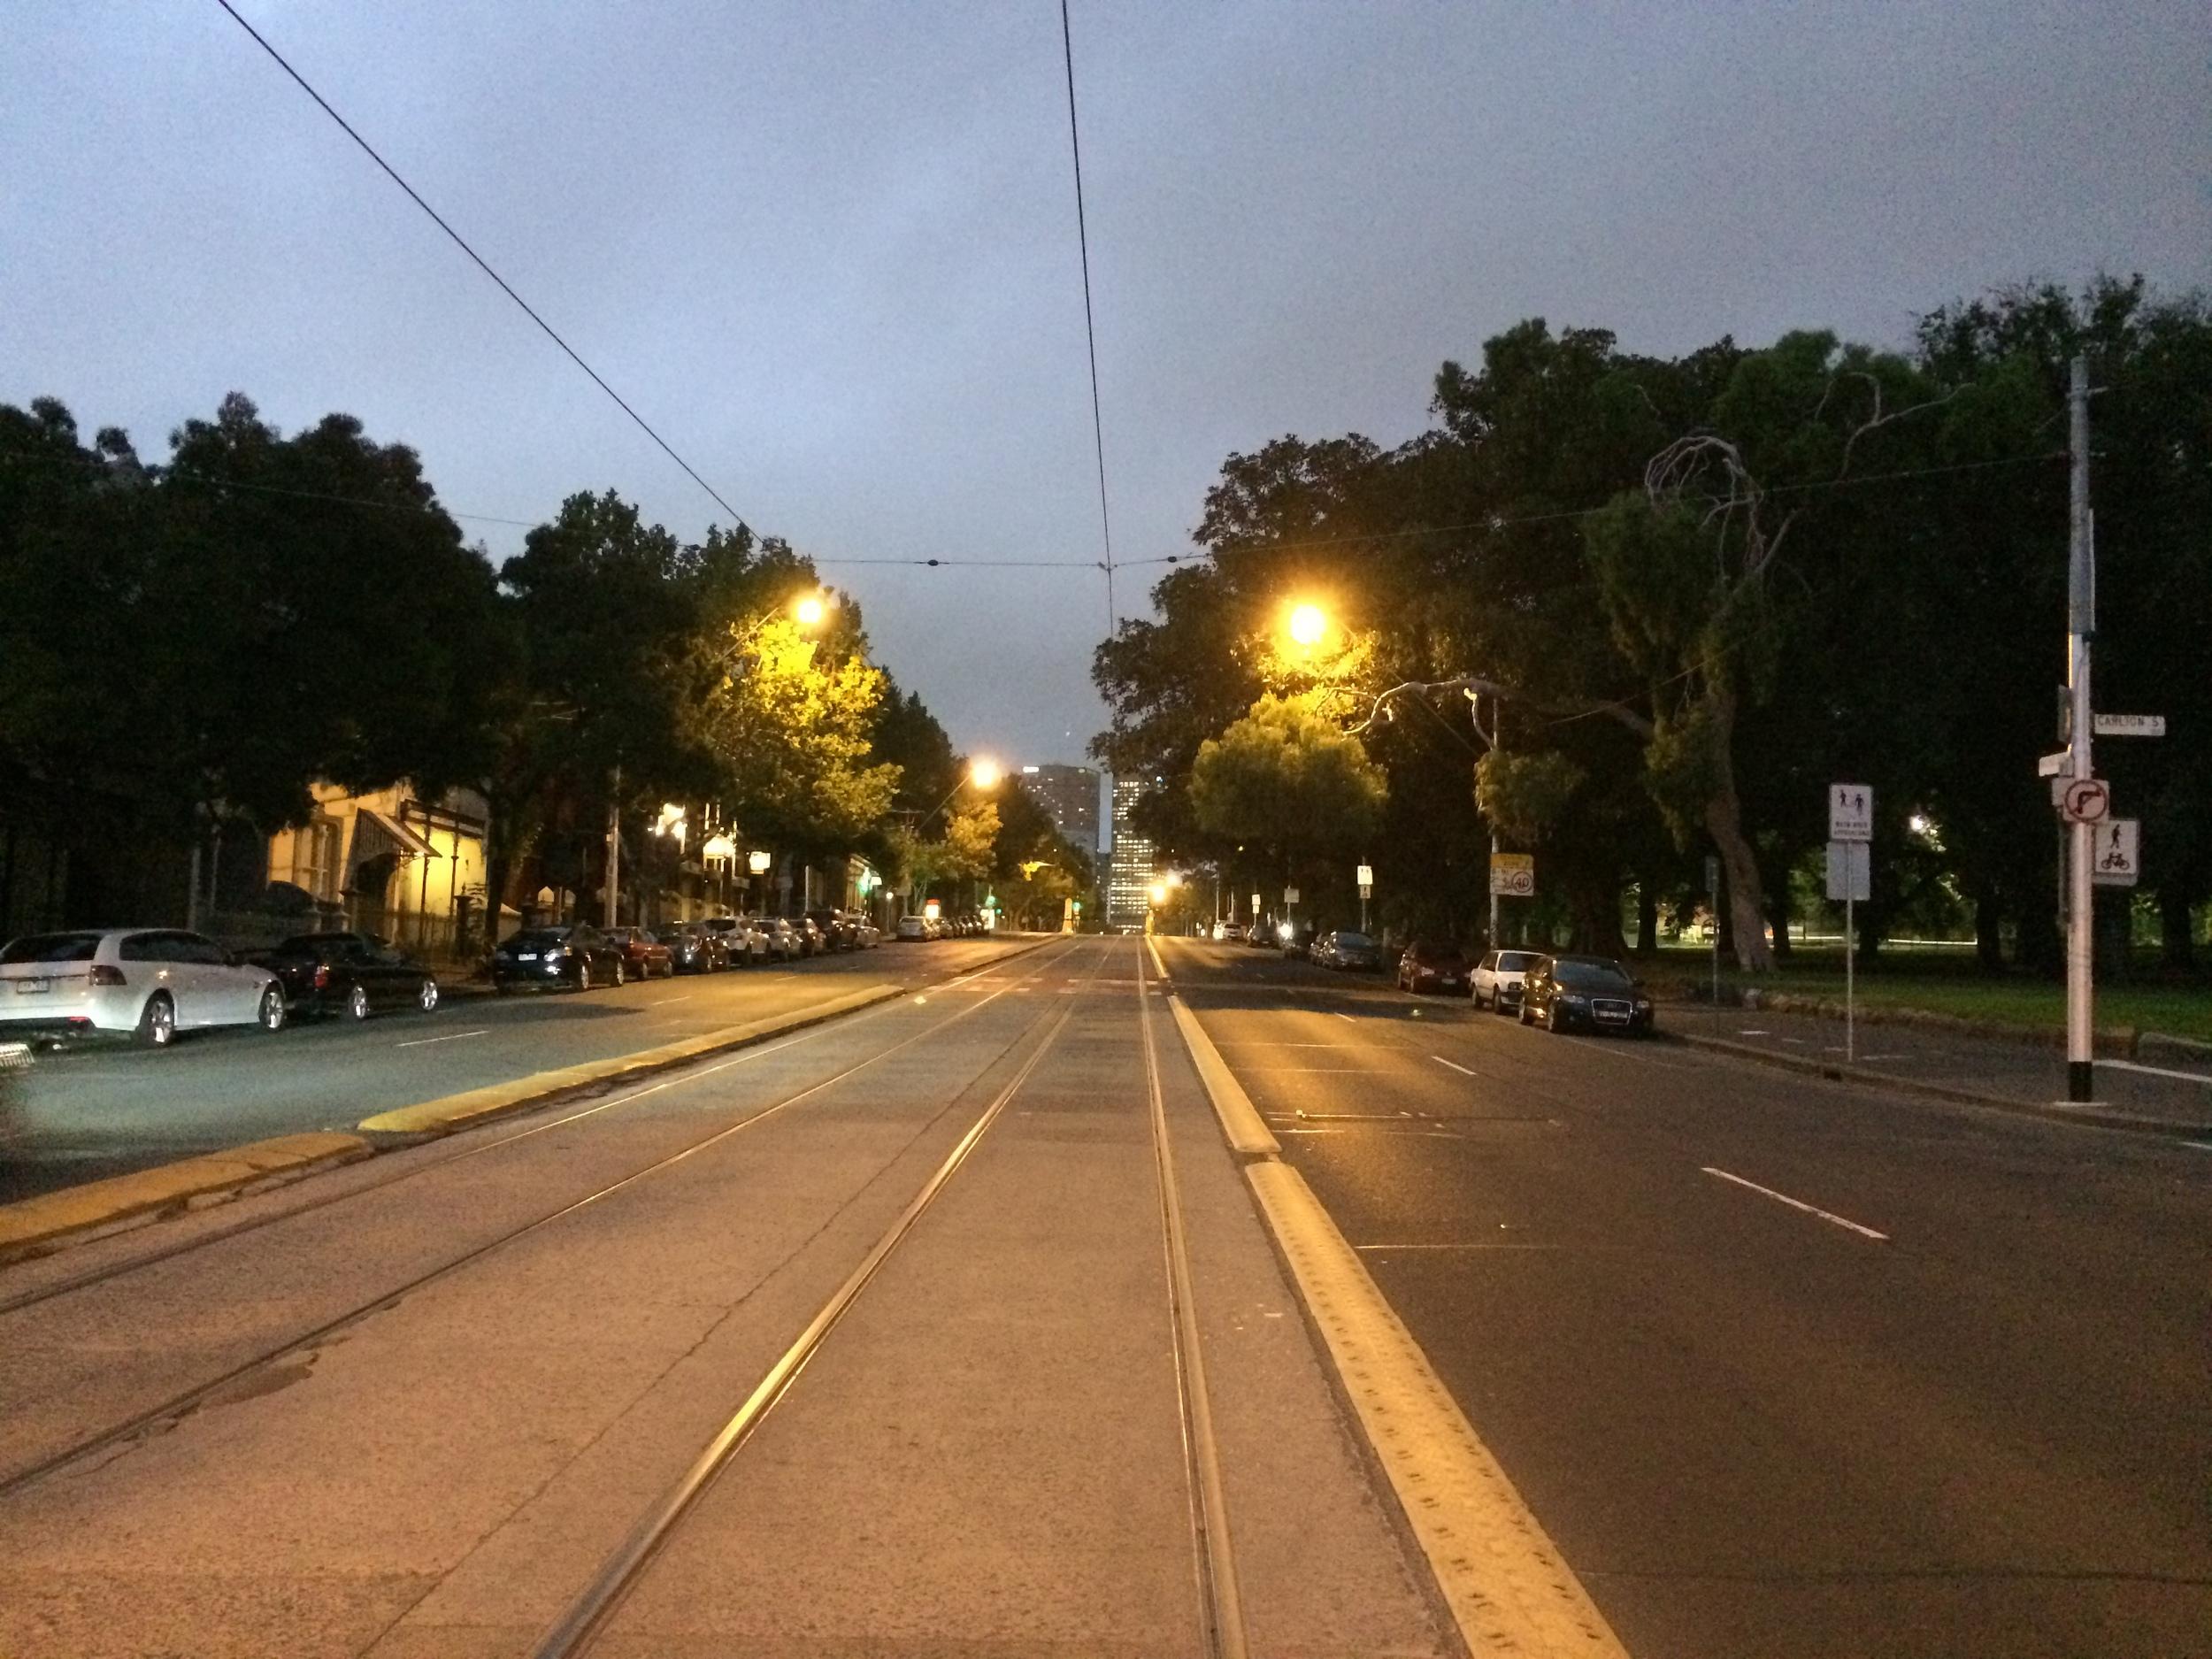 Nicholson St was deserted at 7.30am.